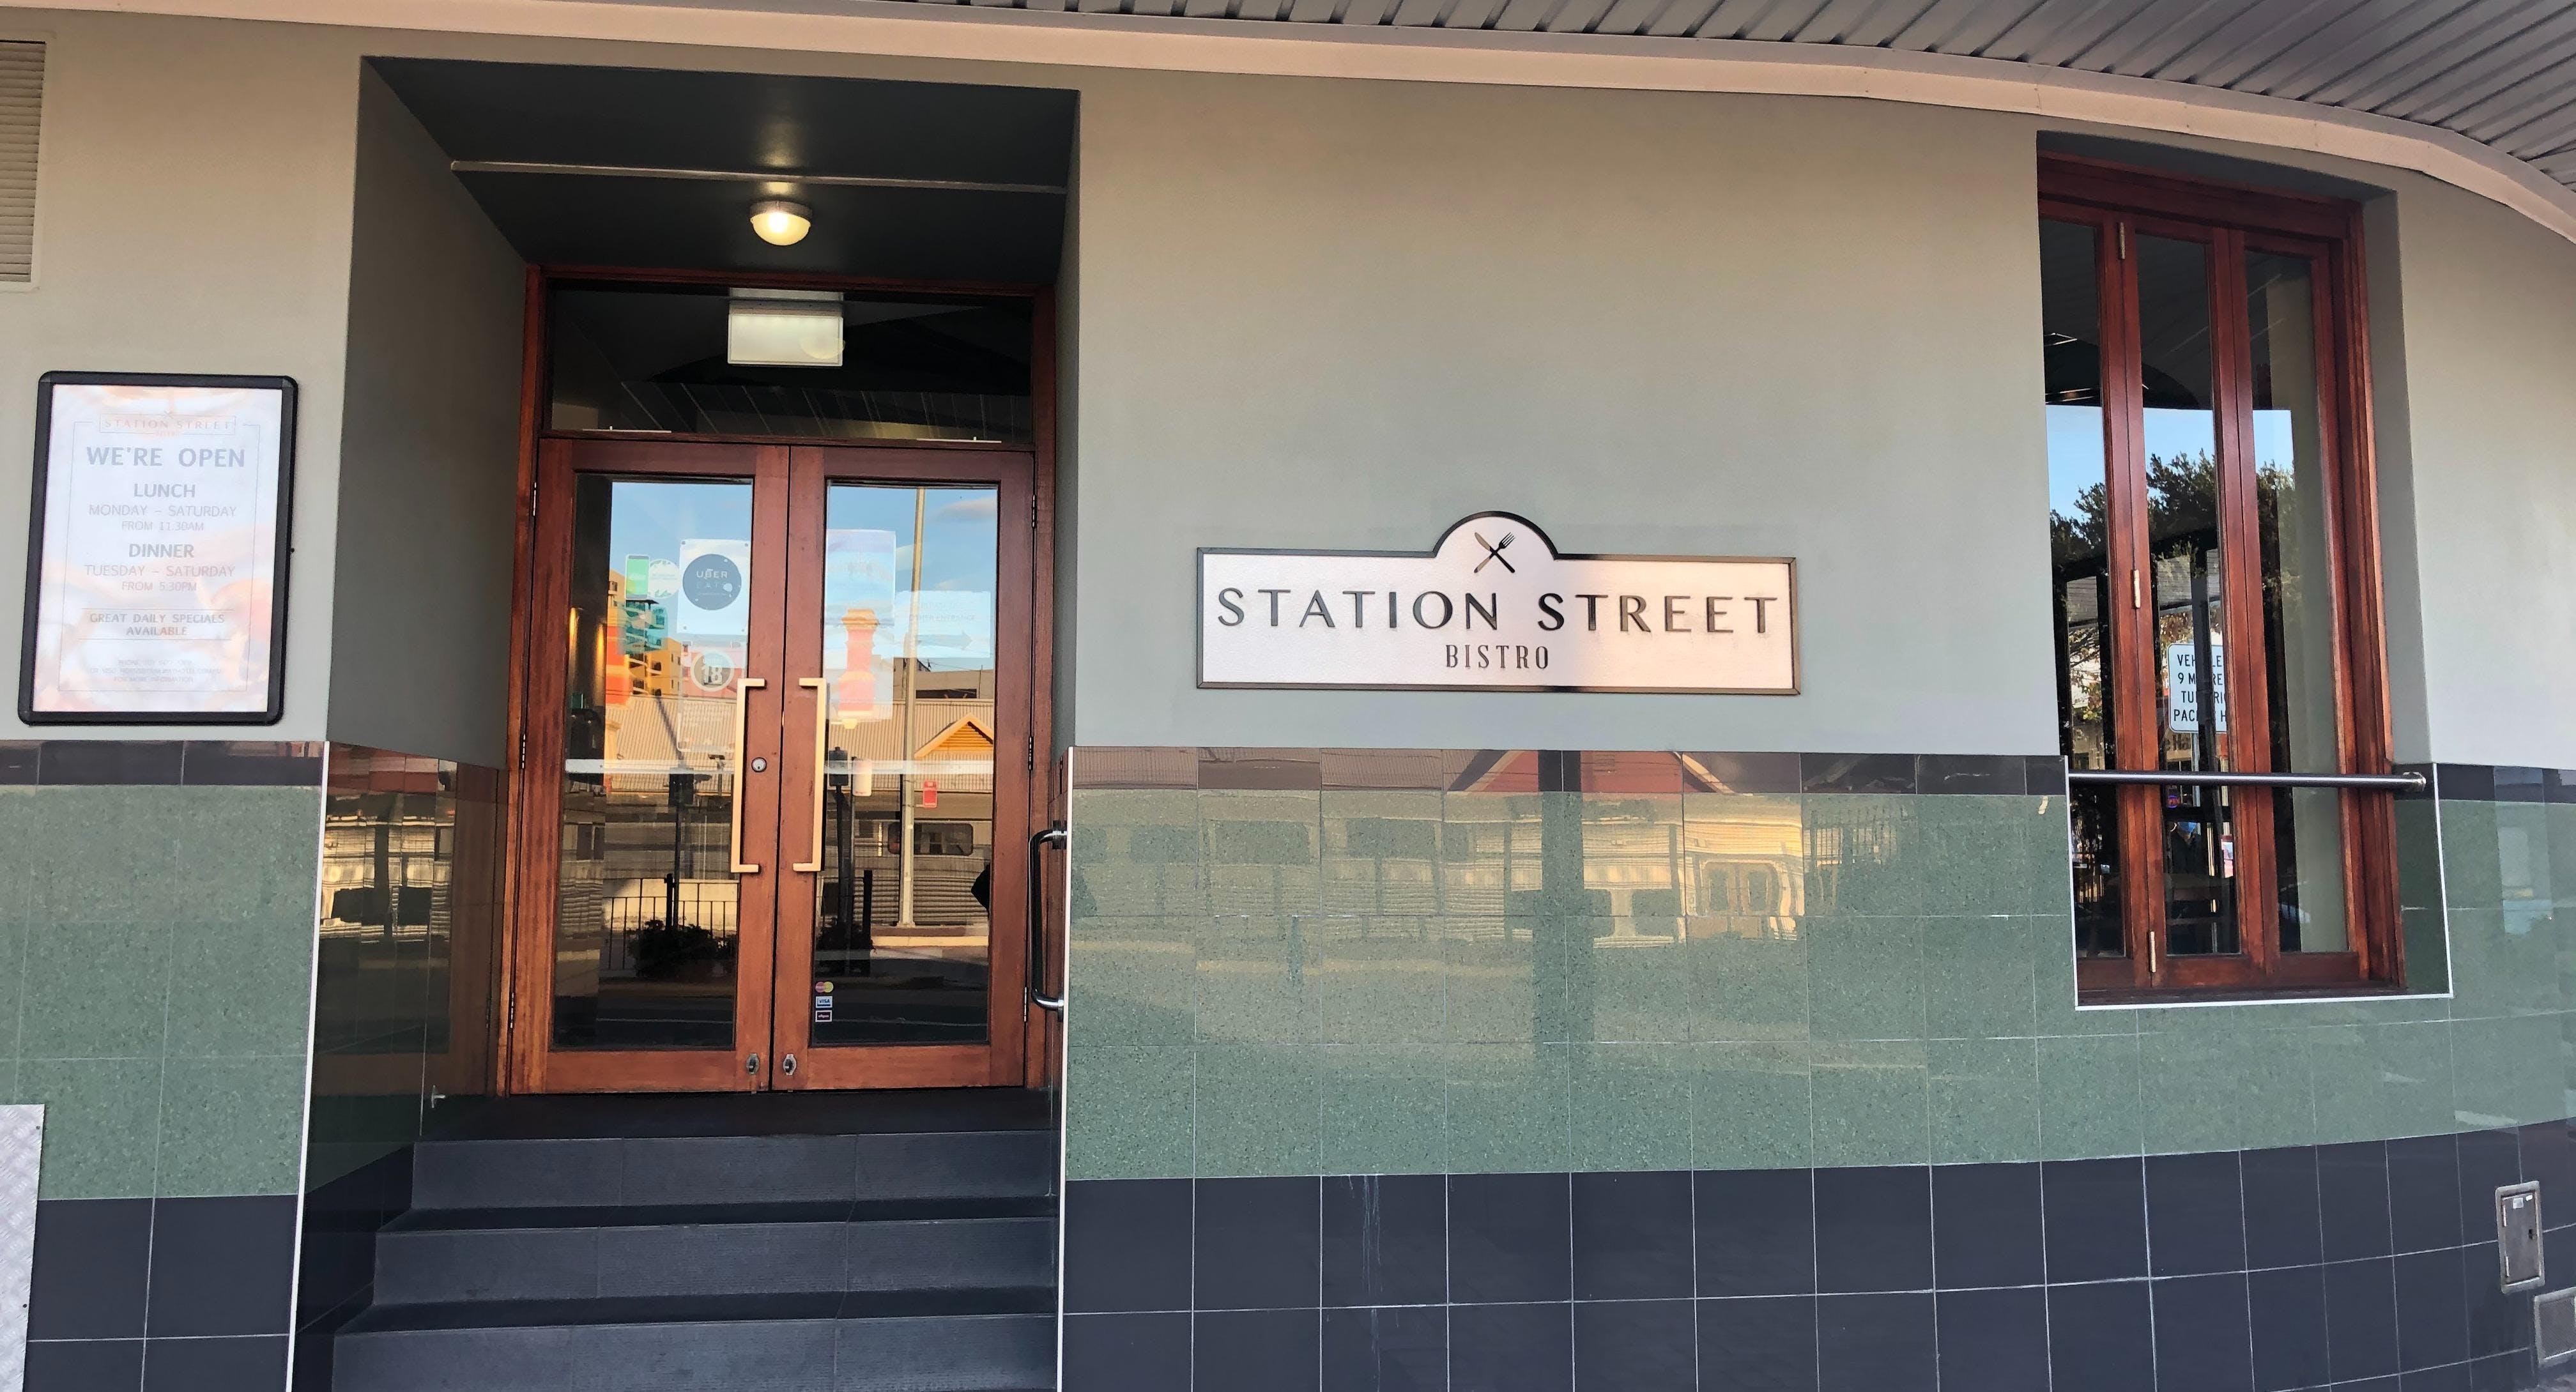 Station Street Bistro